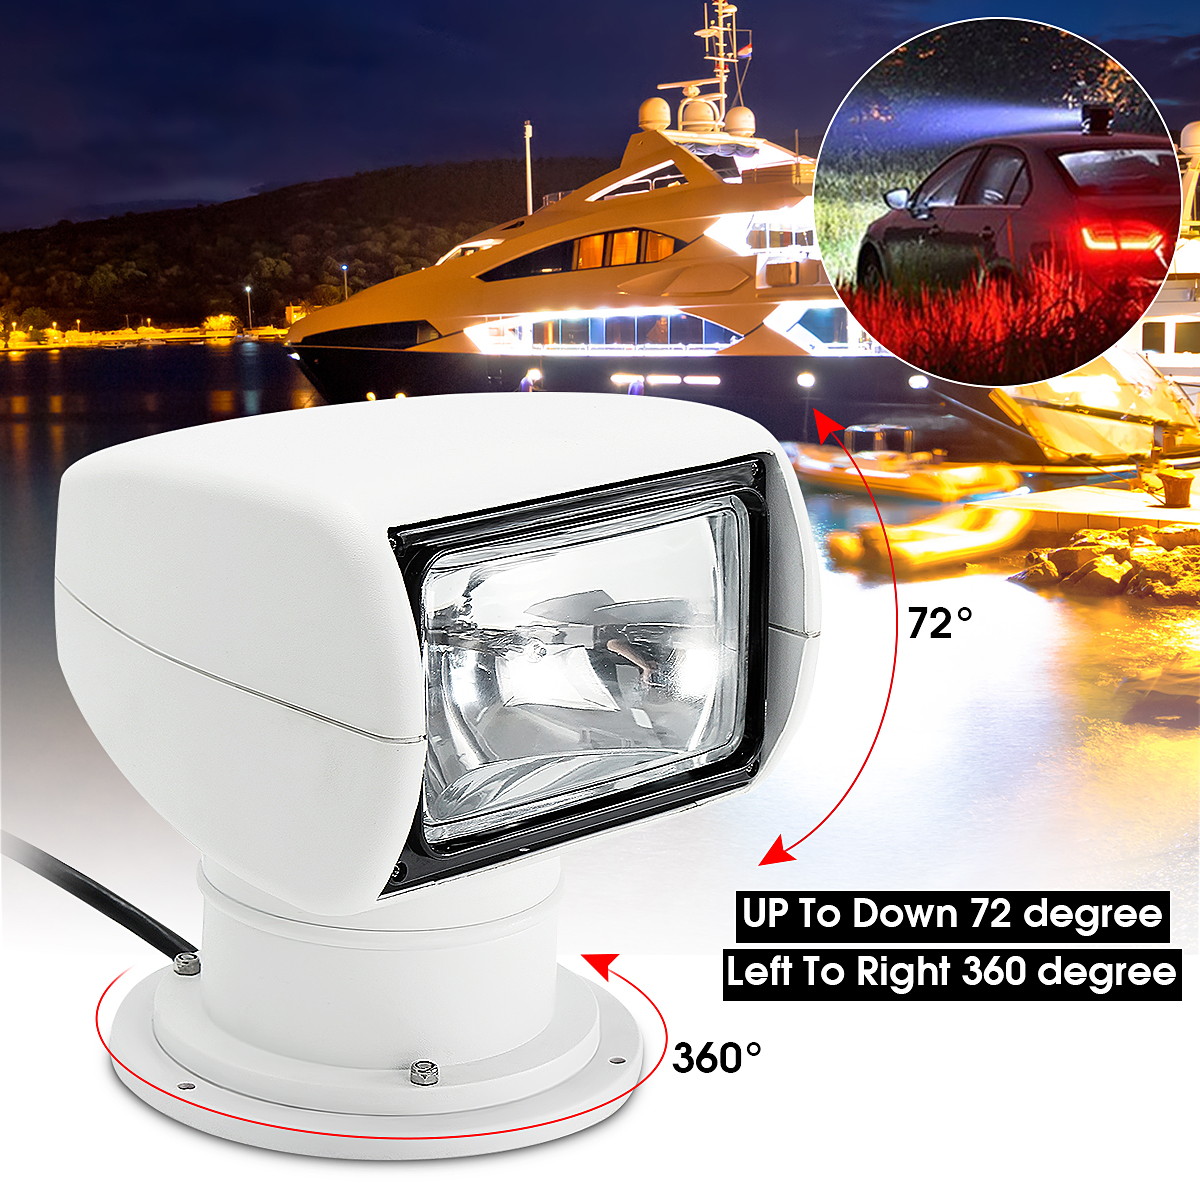 Smuxi Spotlight 12V 100W 2500LM 3200K Marine Searchlight Light Bulb PC+Aluminum Remote Control Multi-angled White